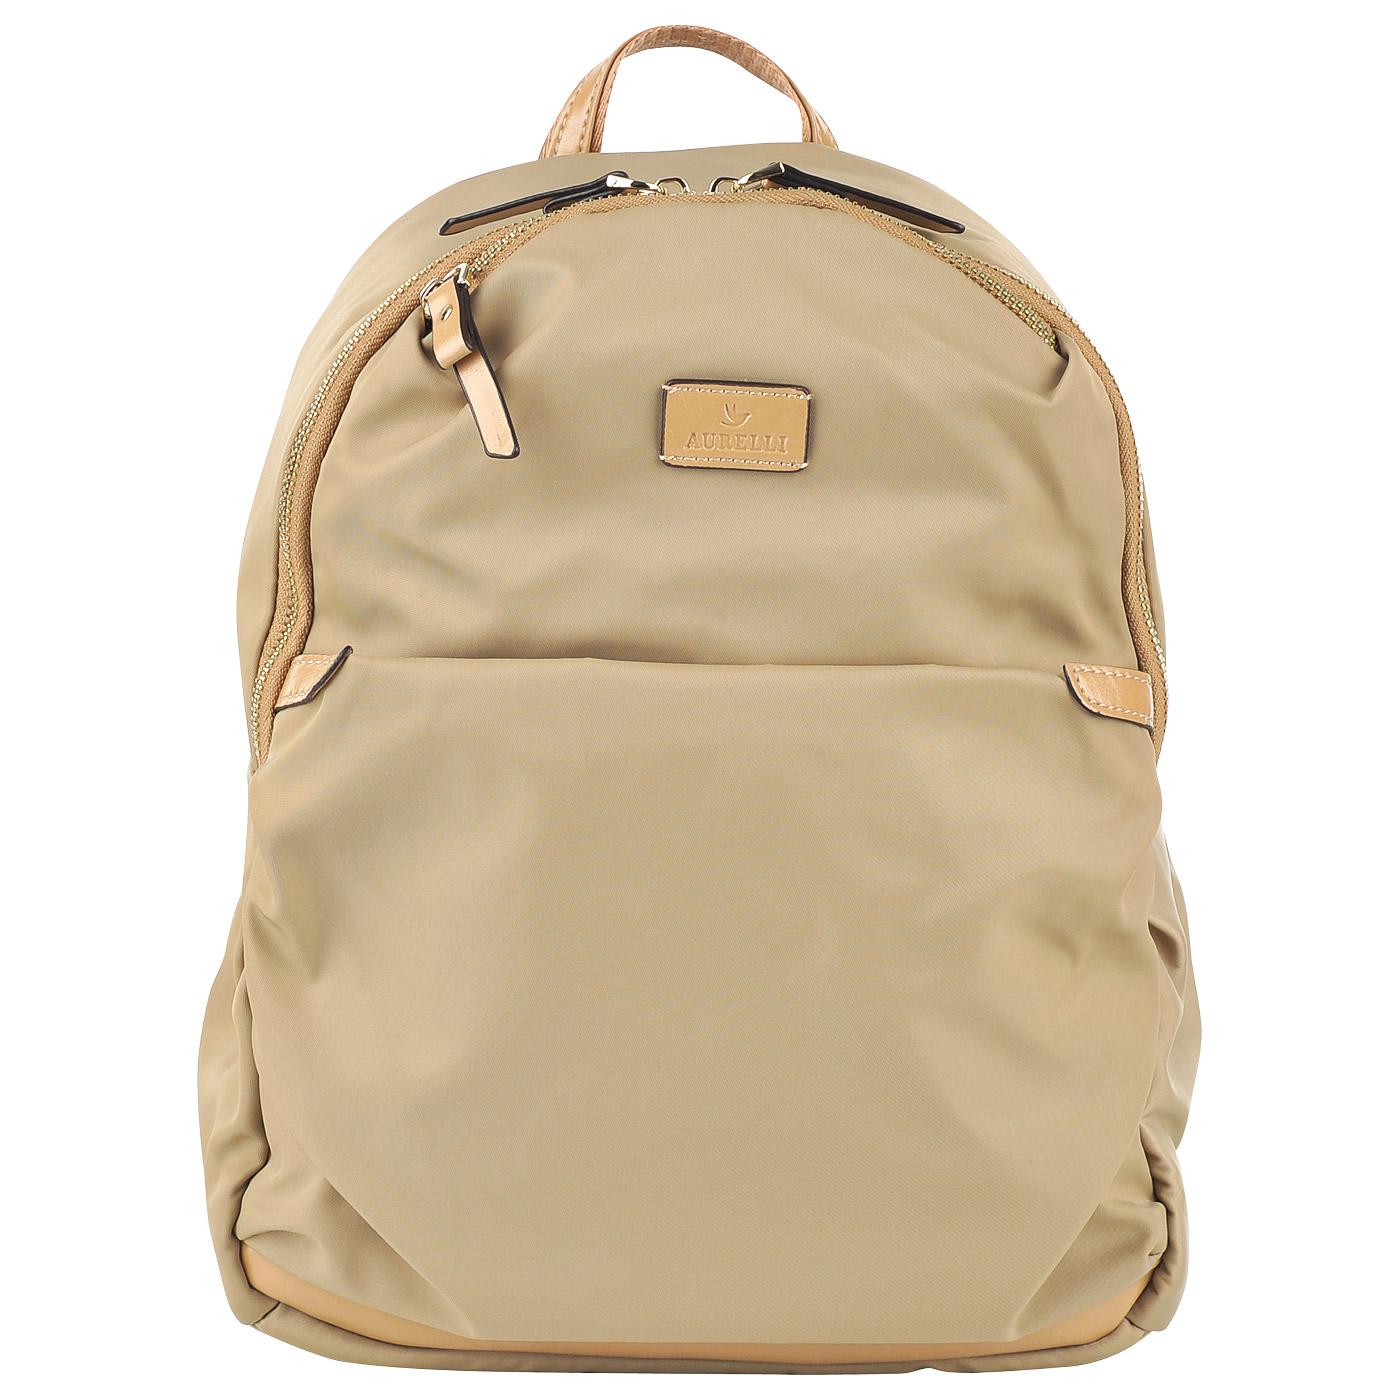 Женский рюкзак Aurelli S17004G taupe - 2000557724075 бежевый ... 9ed5f3c5695